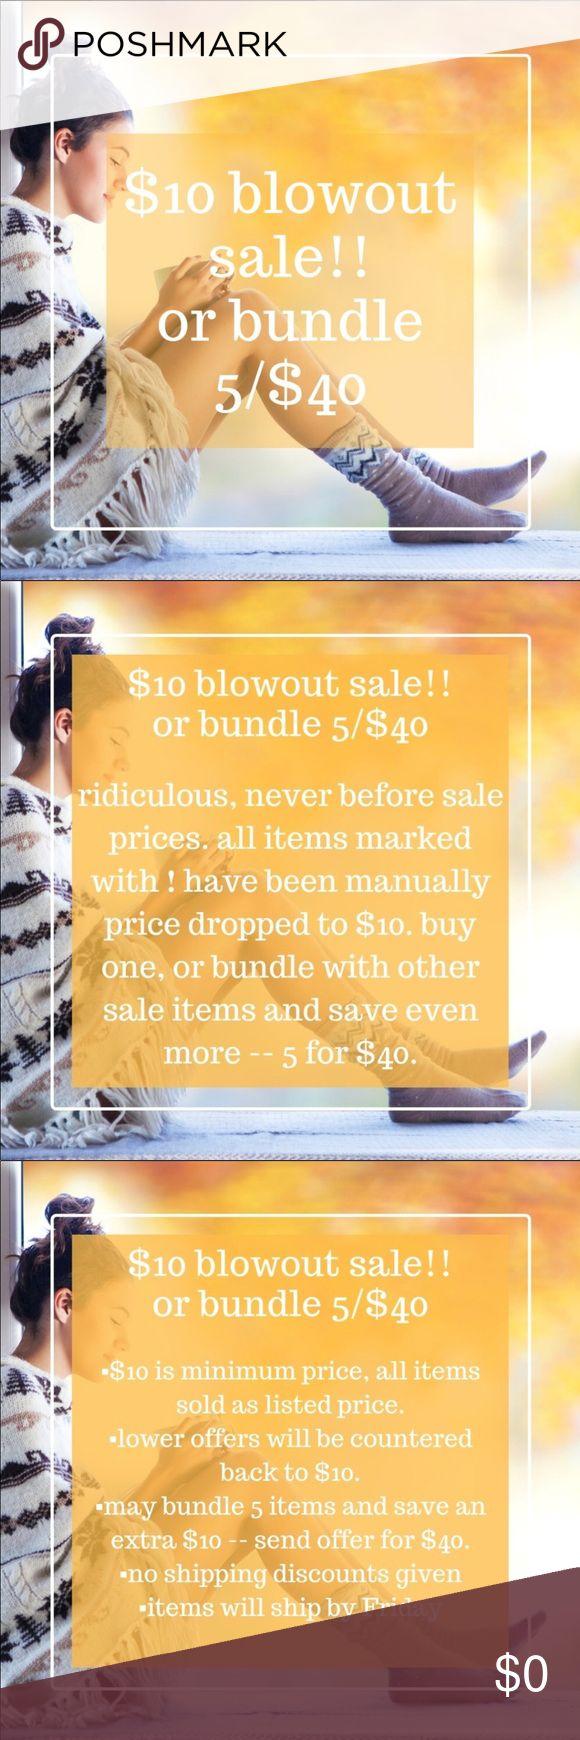 ️10 blowout sale Blowout sale, Blowout, 10 things